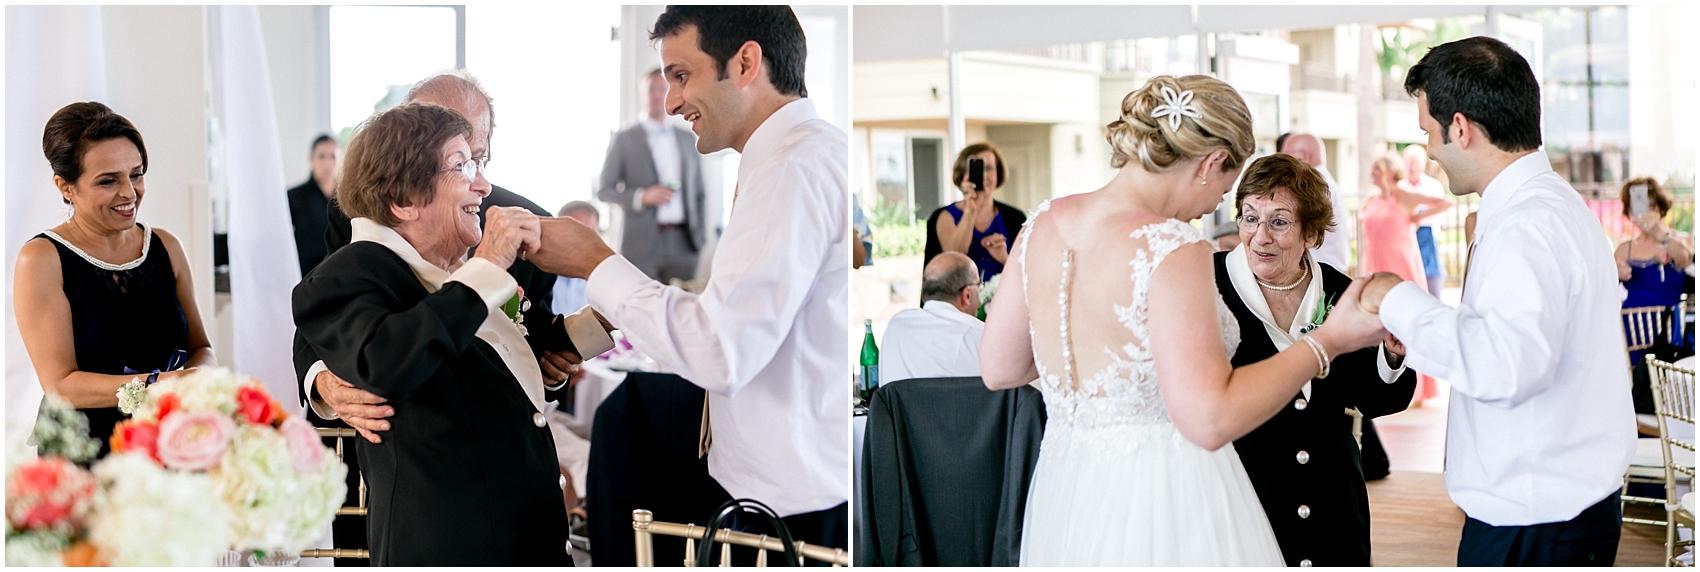 Jen and Mark's Wedding-0793.jpg